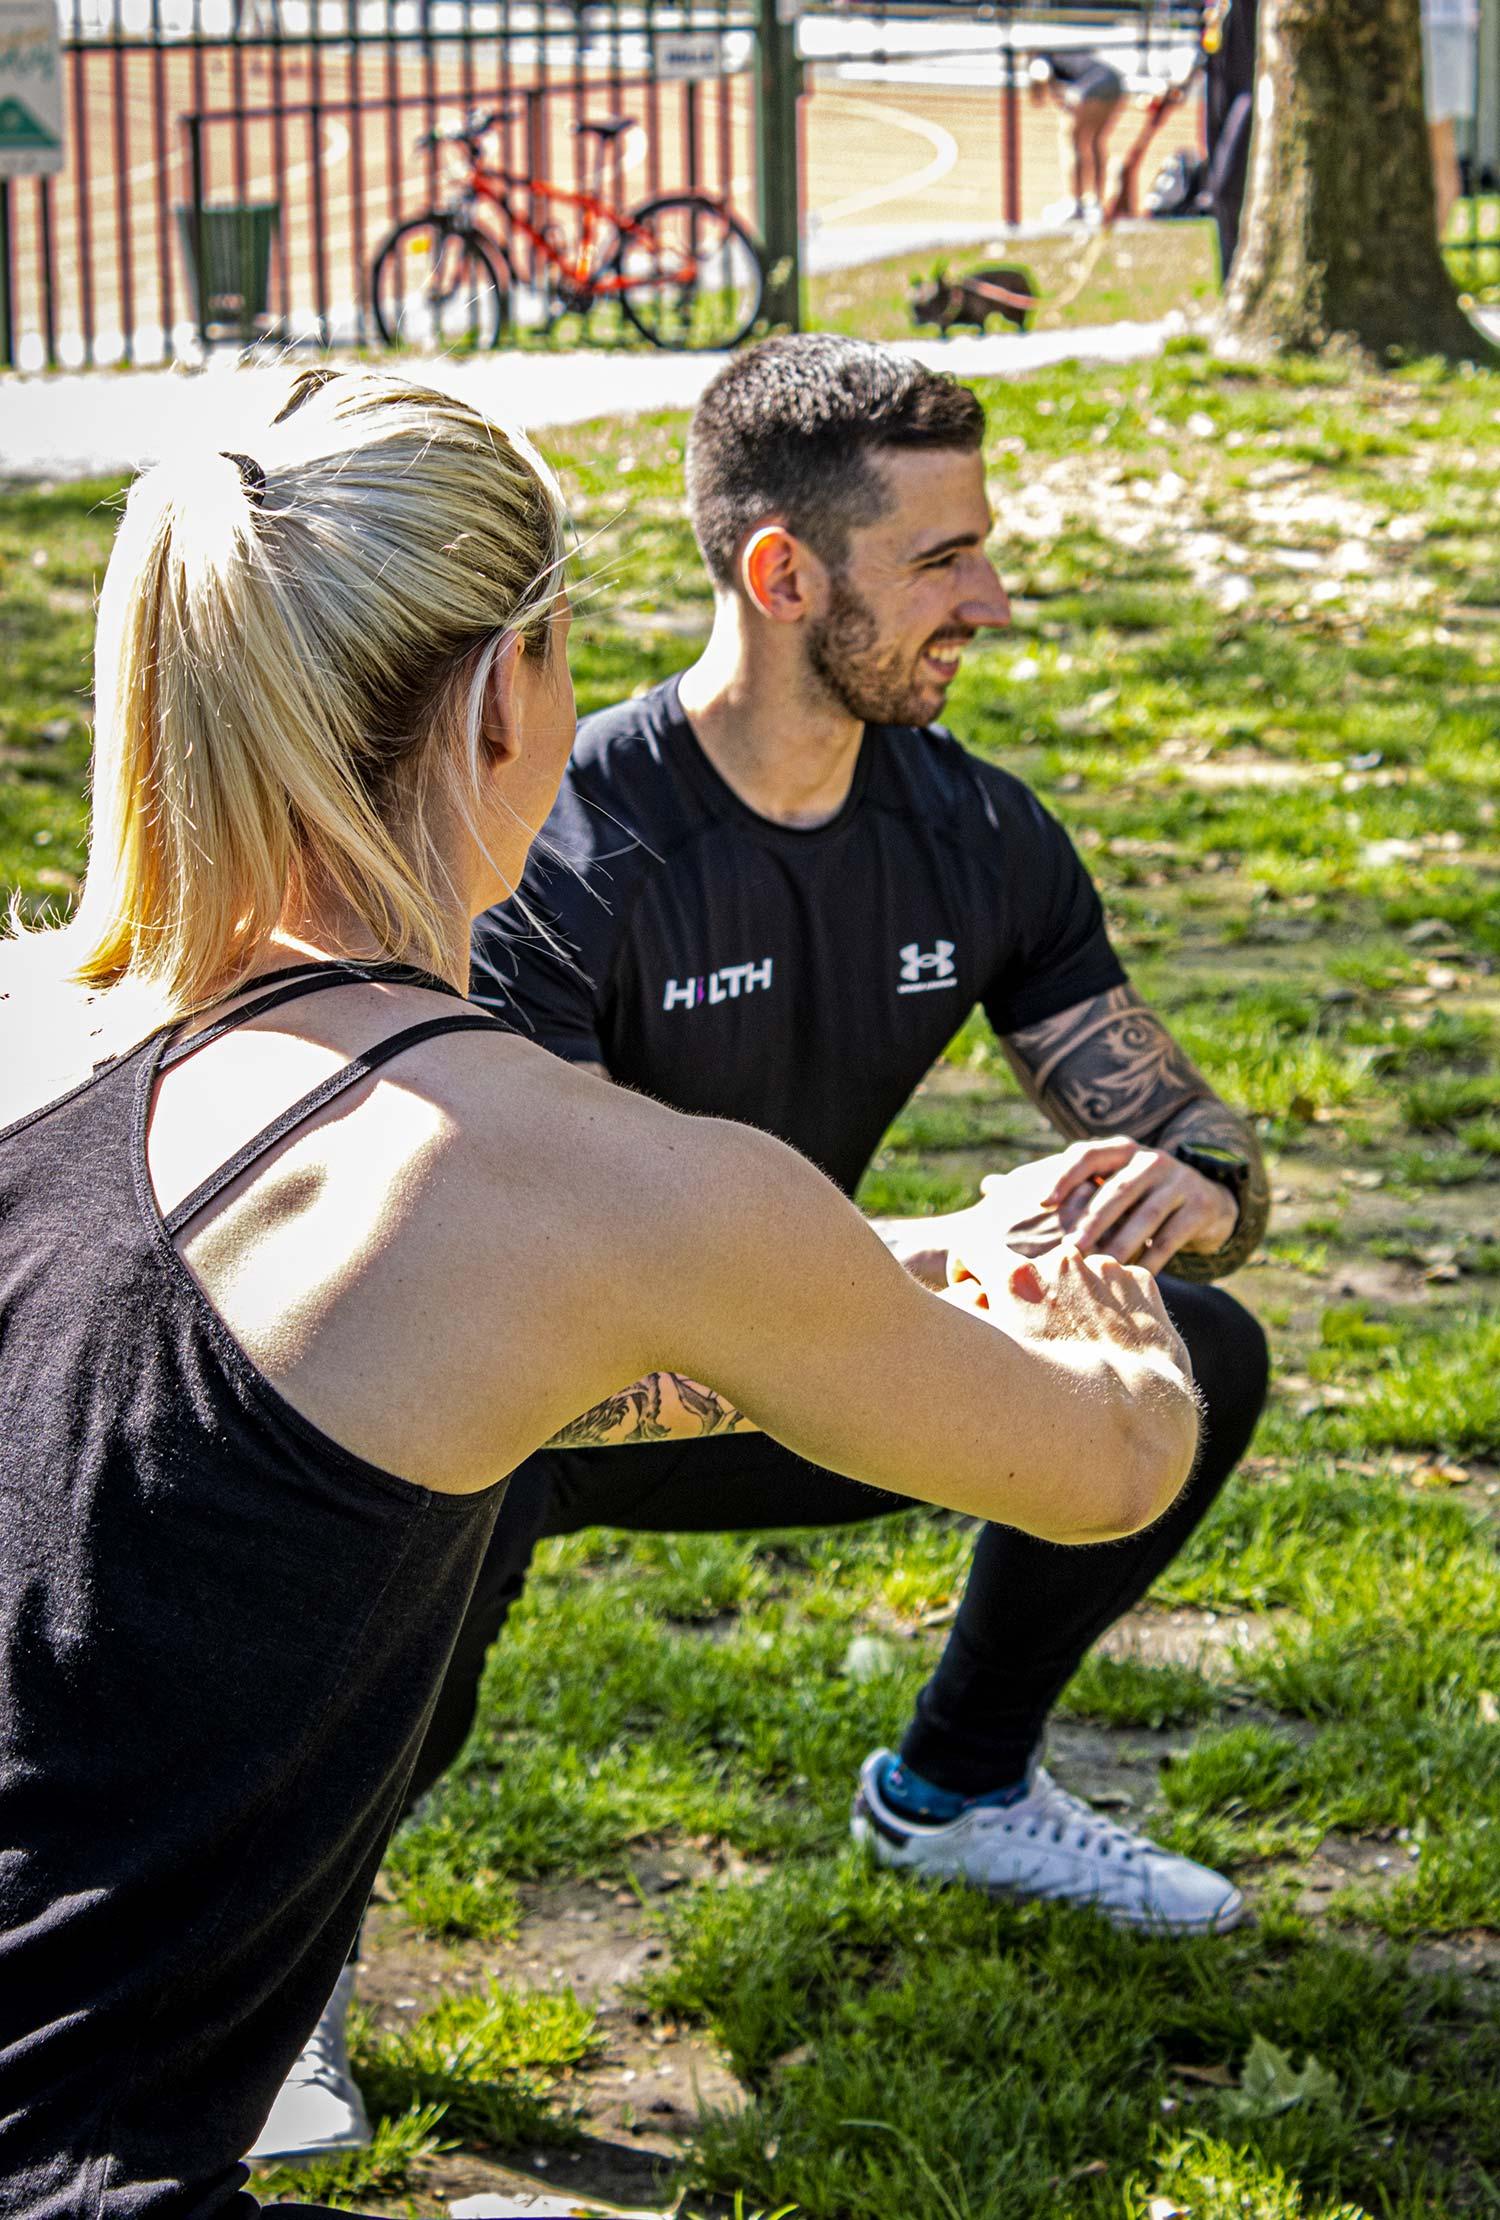 Hilth personal training foto 2